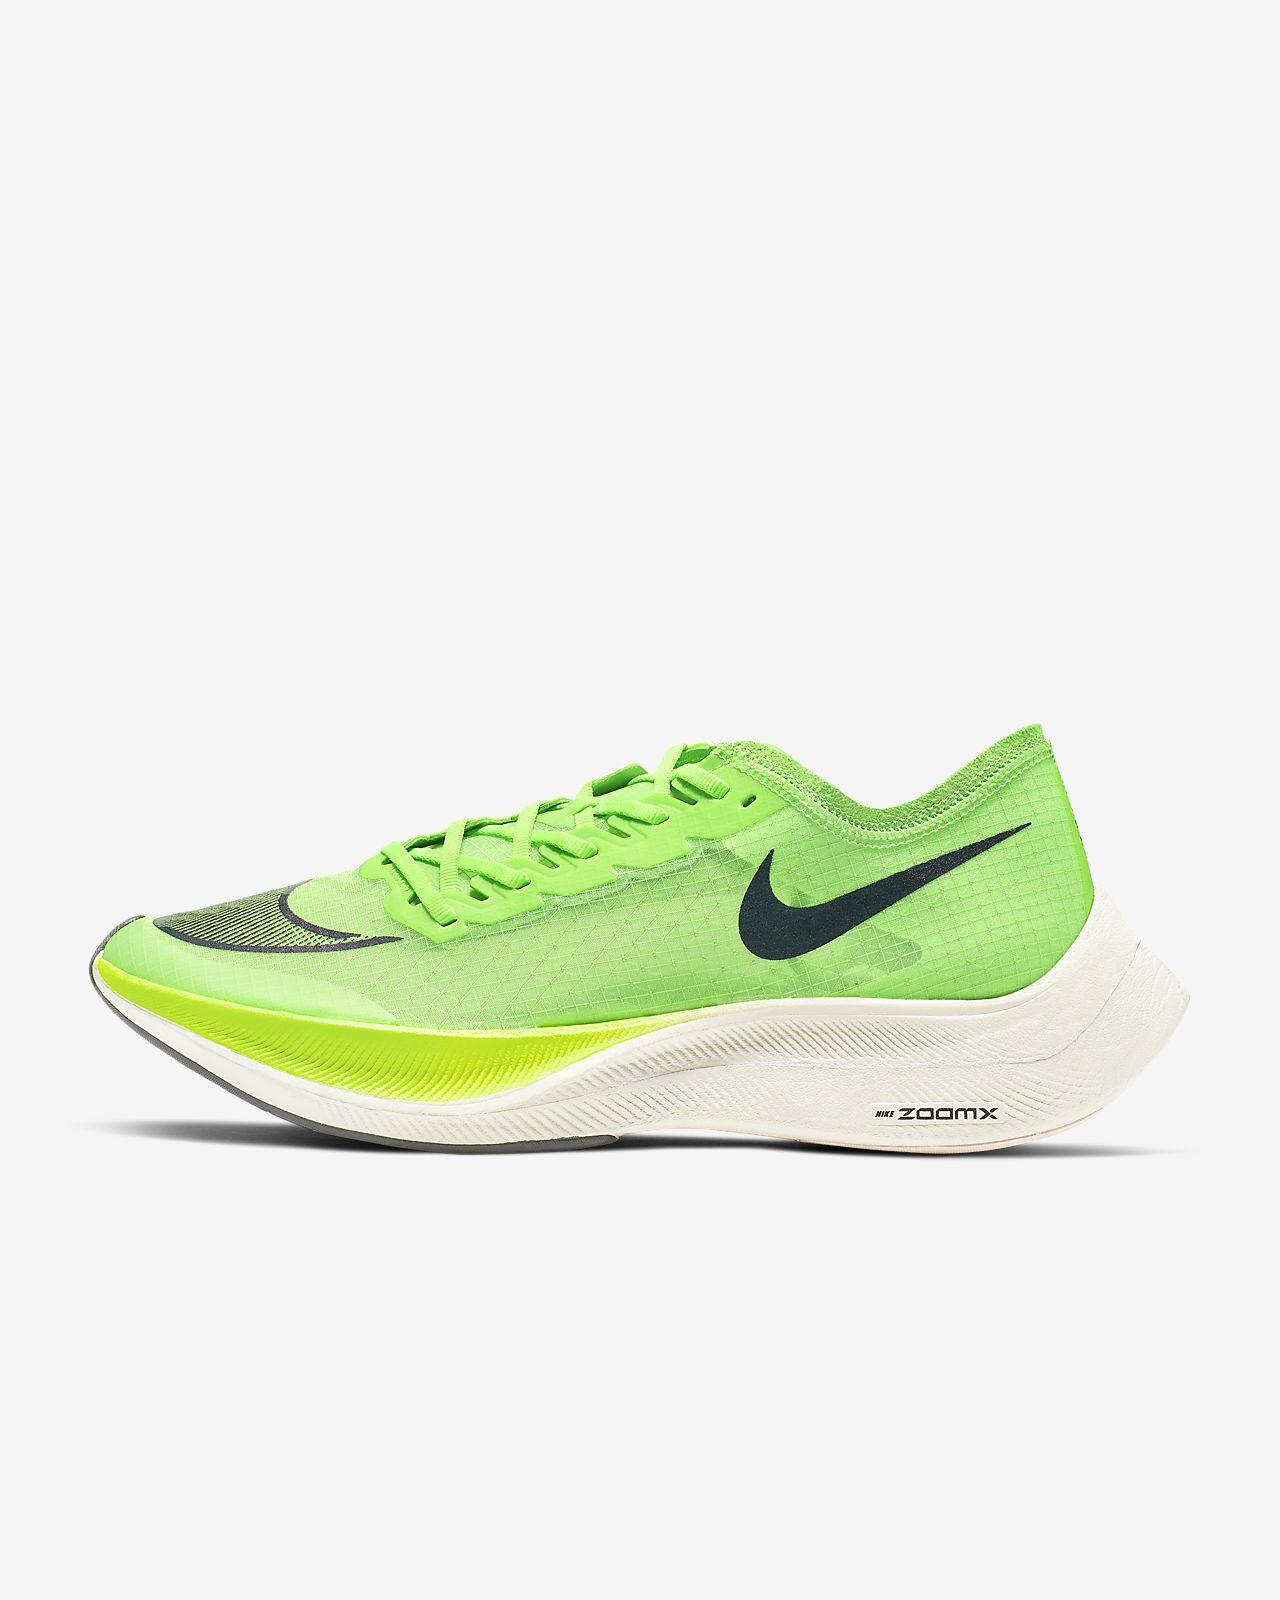 Calzado de running Nike ZoomX Vaporfly NEXT%